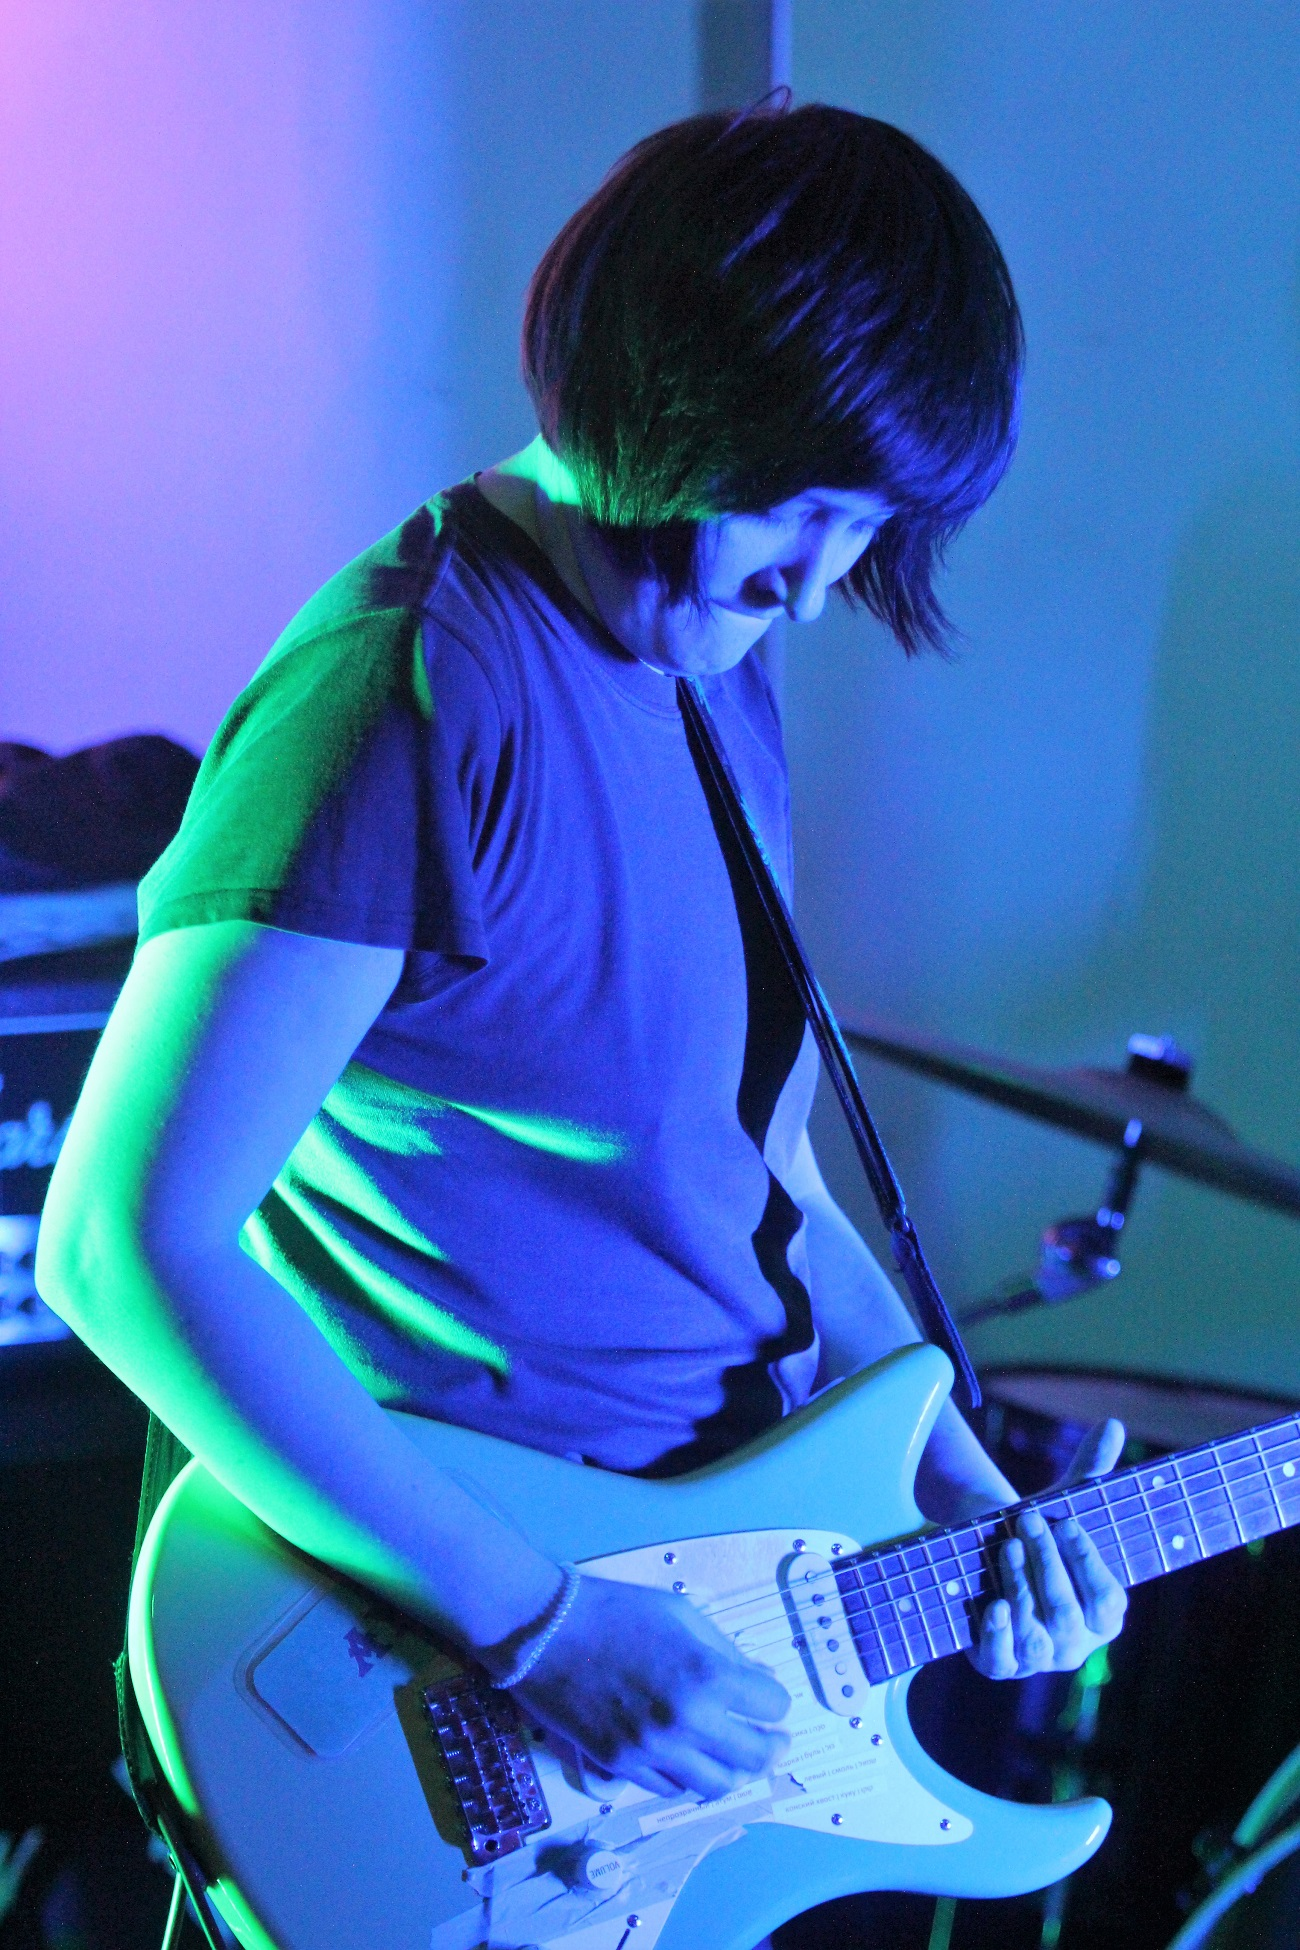 Mirrored Lips' guitarist Sasha Philippova playing at Empty Shop. Source: Andy Potts